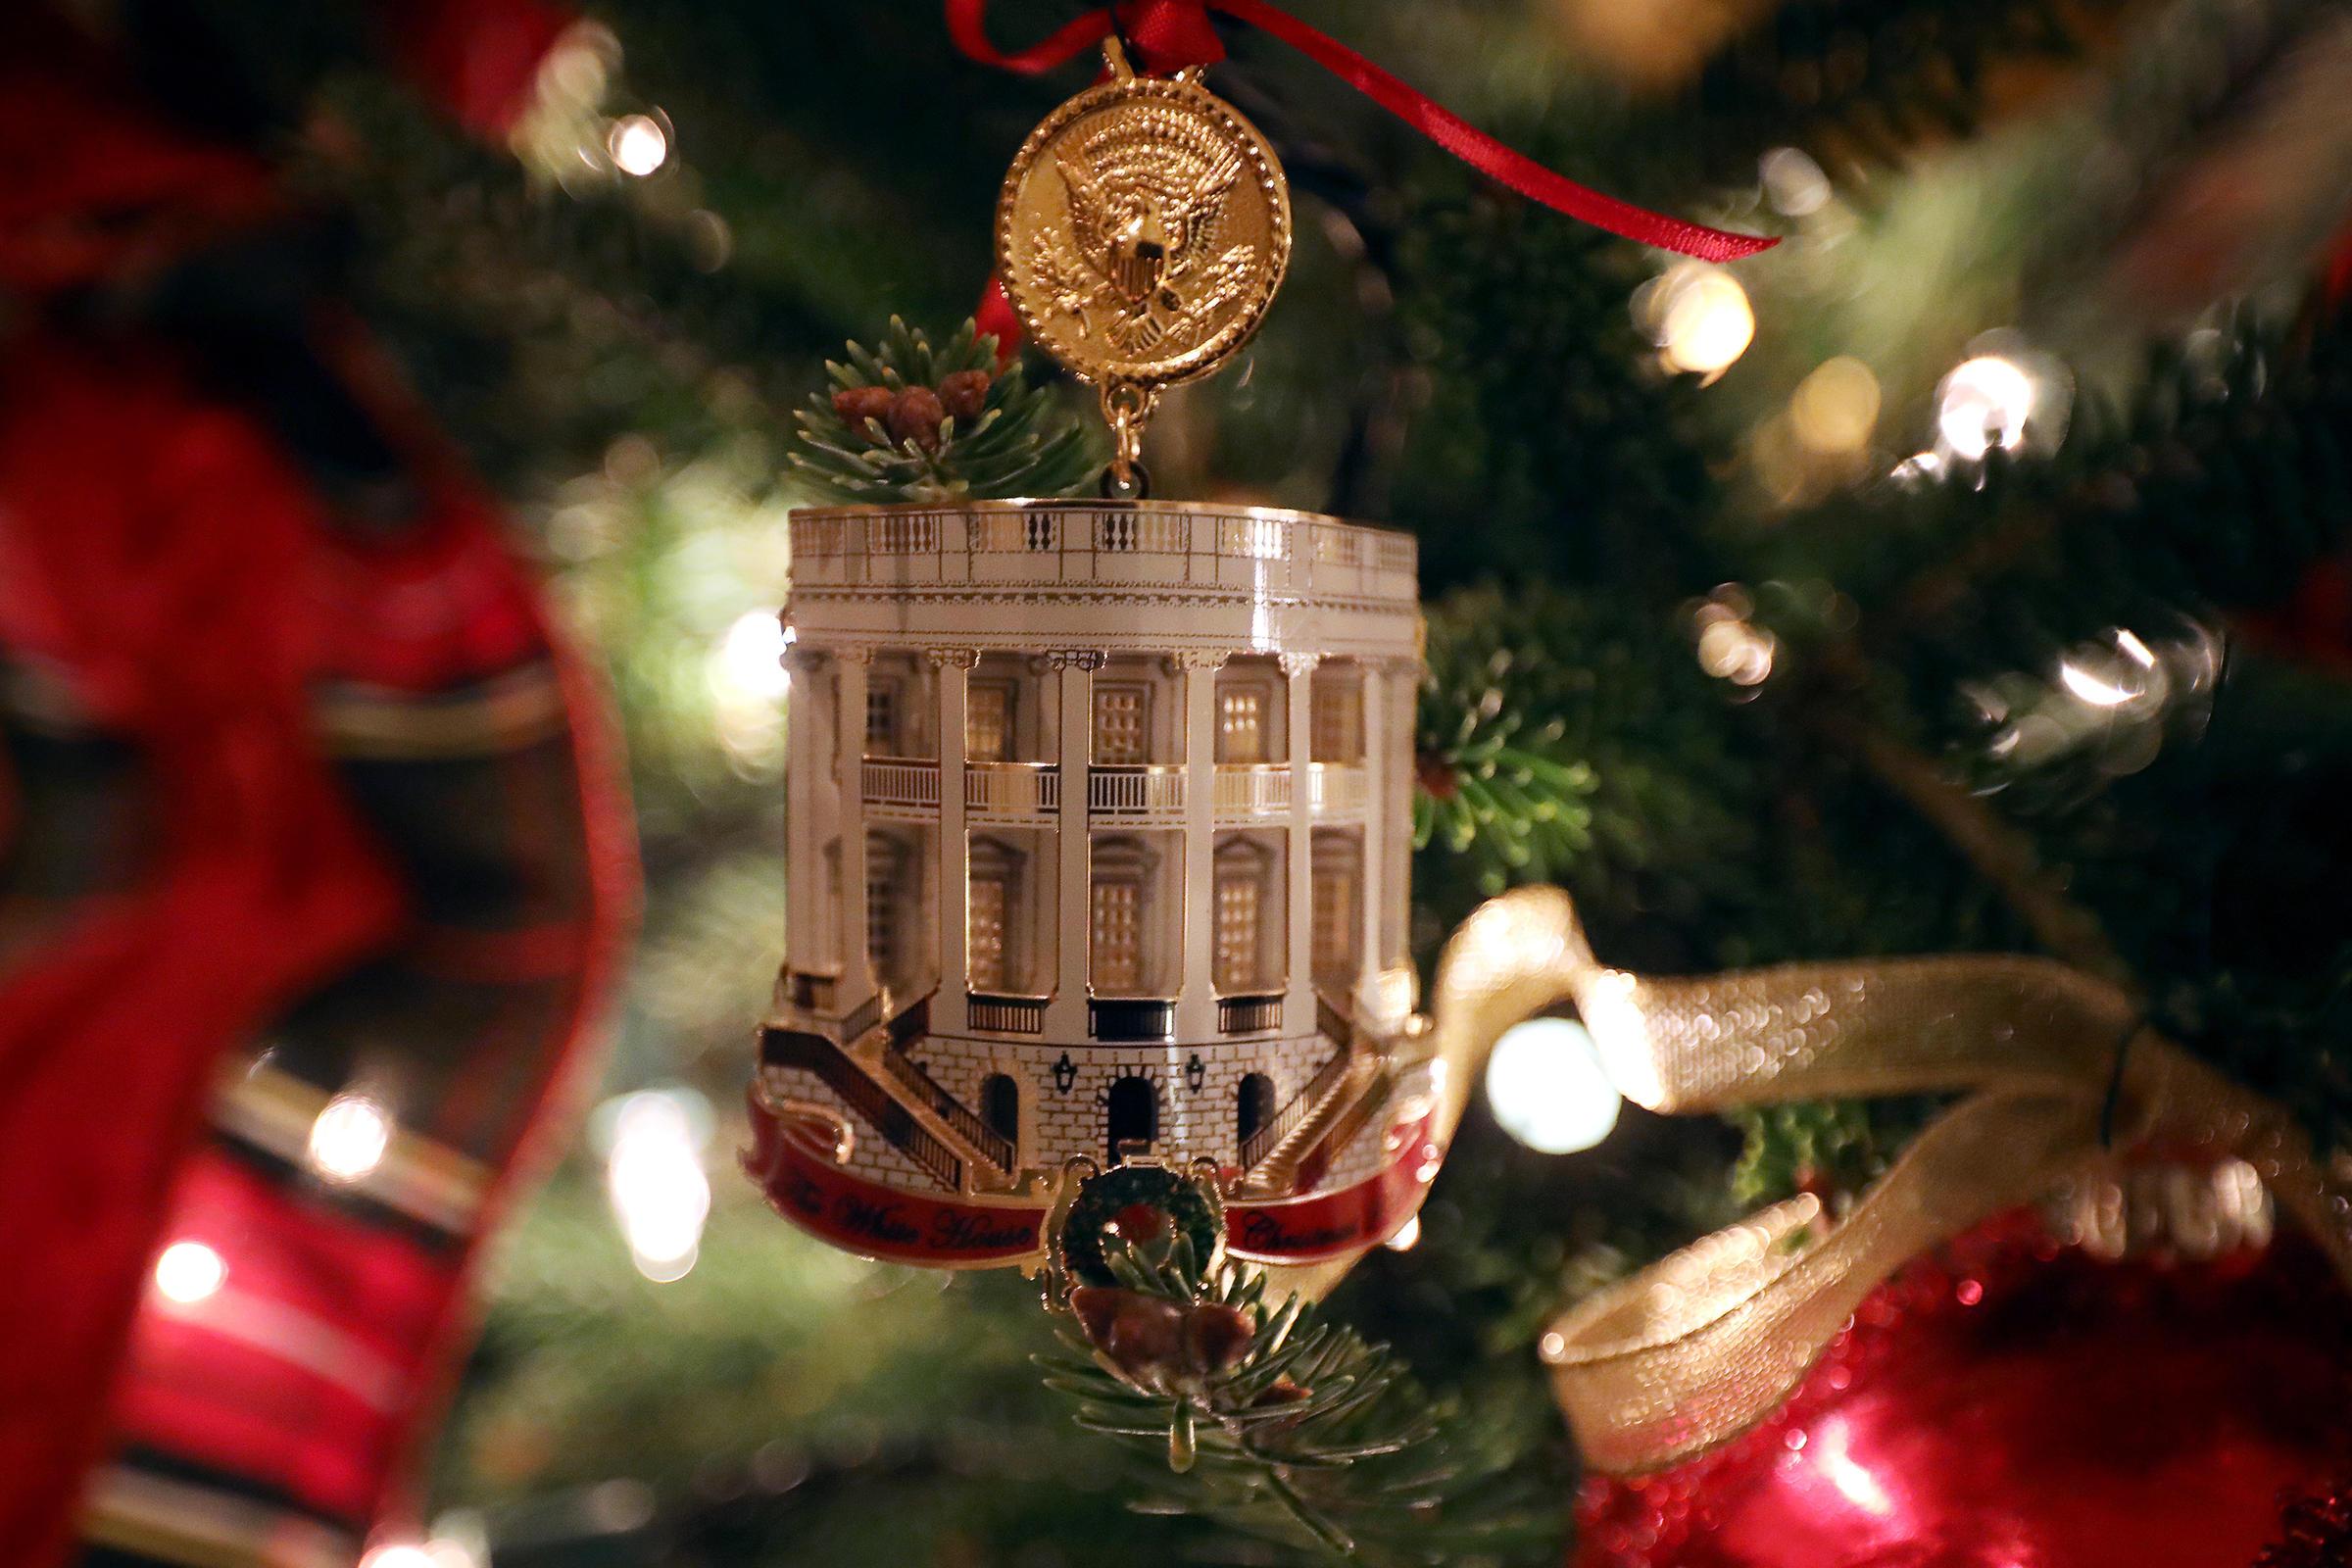 Longtime Trump personal aide Jordan Karem to depart White House